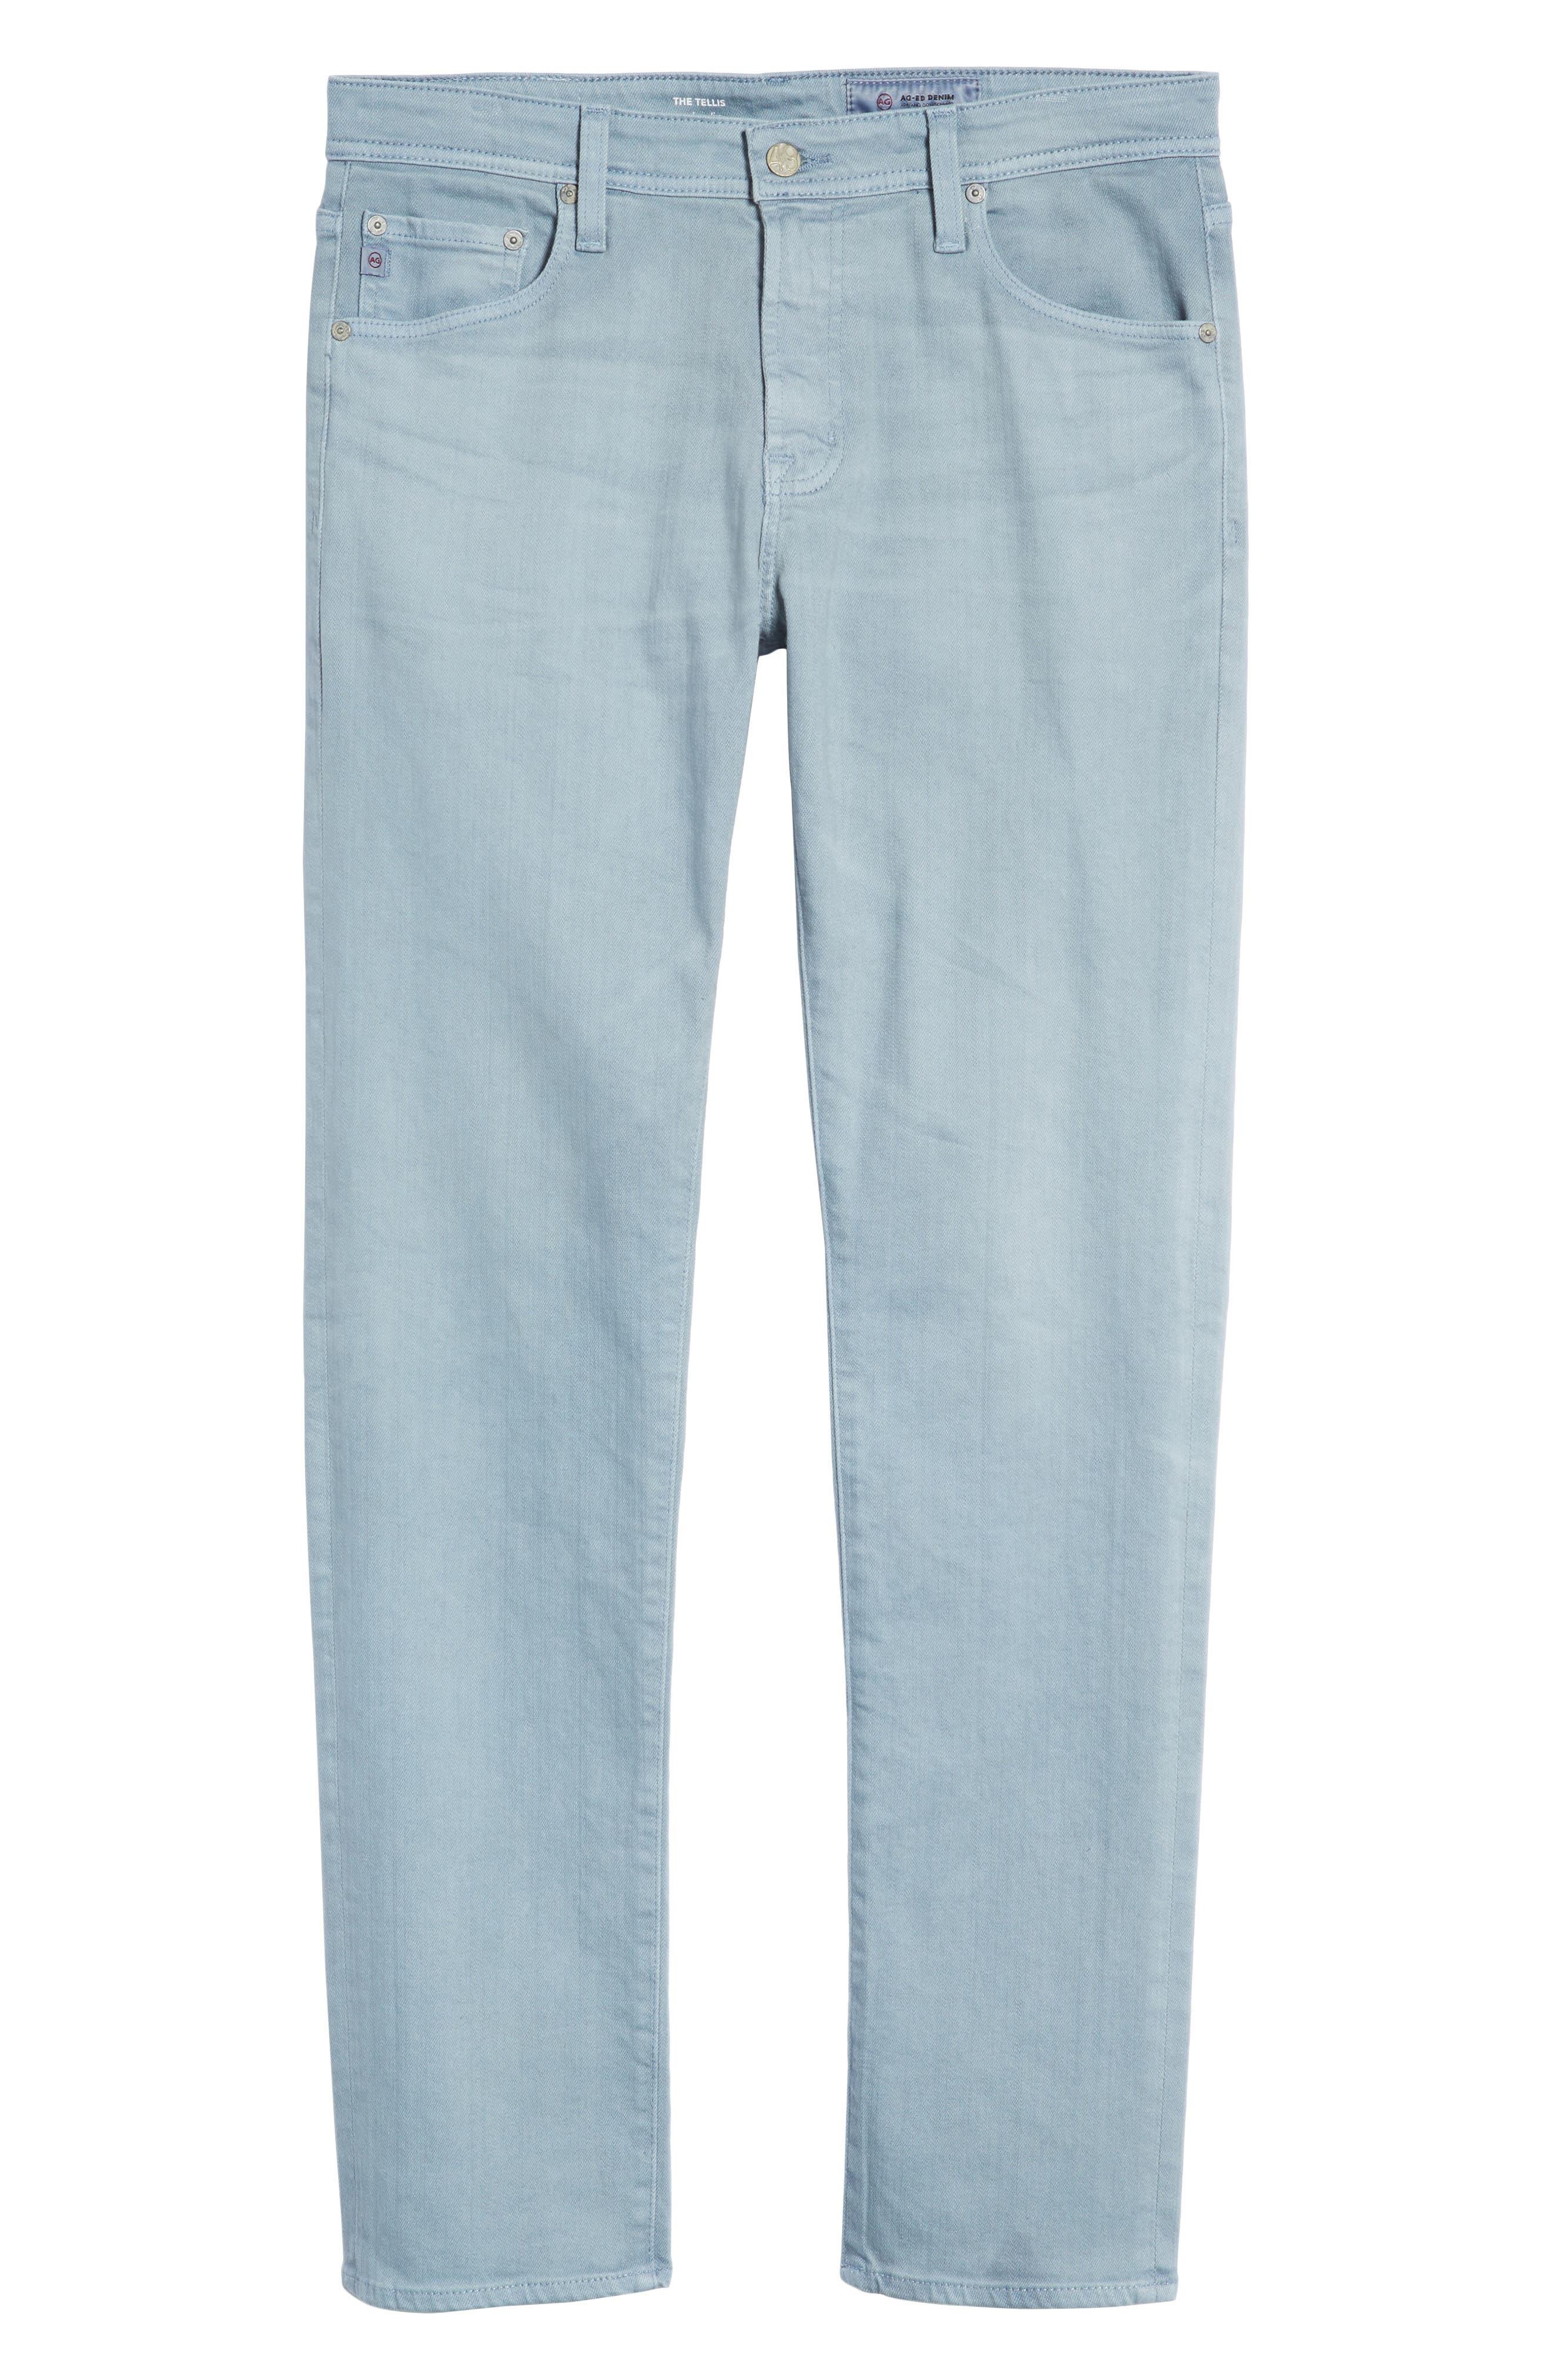 Tellis Slim Fit Jeans,                             Alternate thumbnail 6, color,                             480